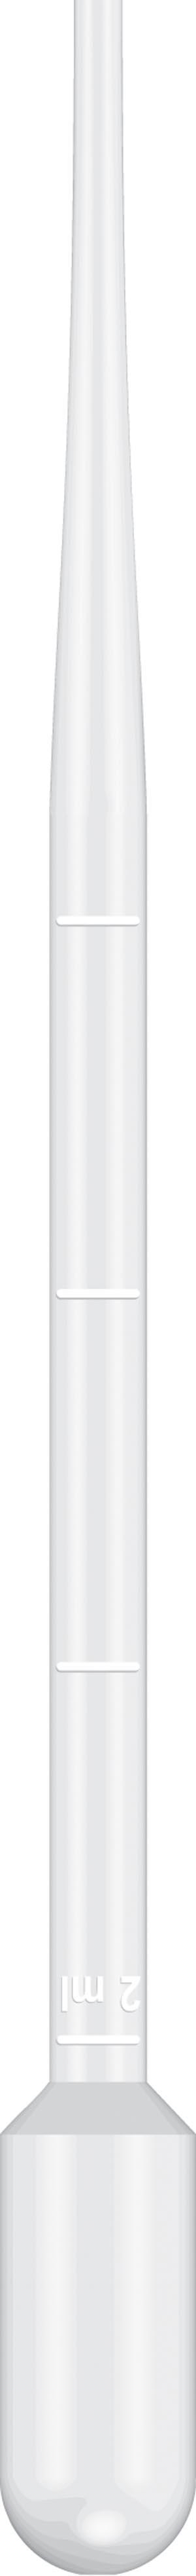 Graduated Pipet, 15.6cm Length, 5mL Capacity, Non-Sterile, 500/pk, 10 pk/cs